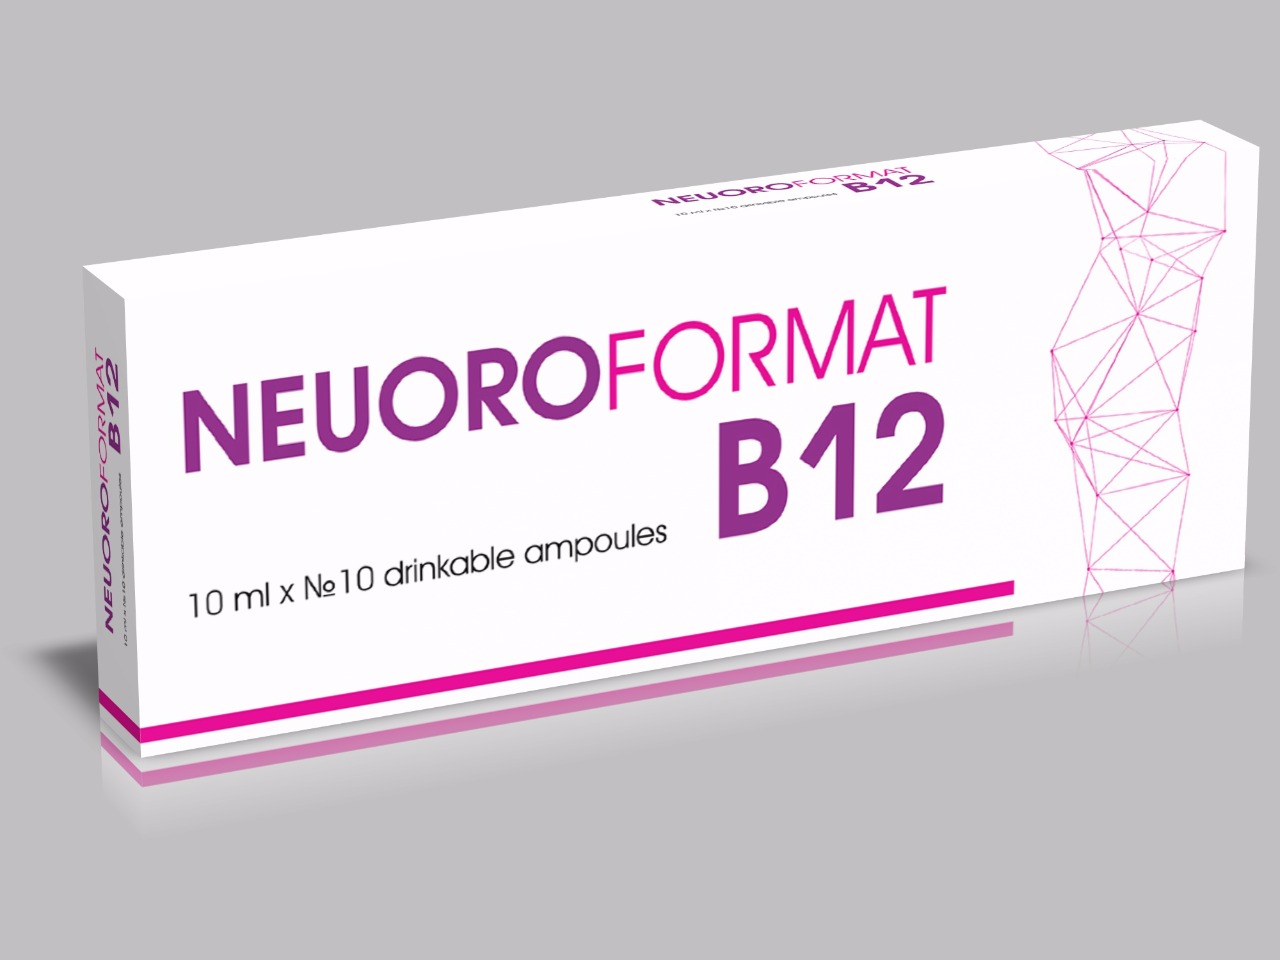 Neuroformat-B12